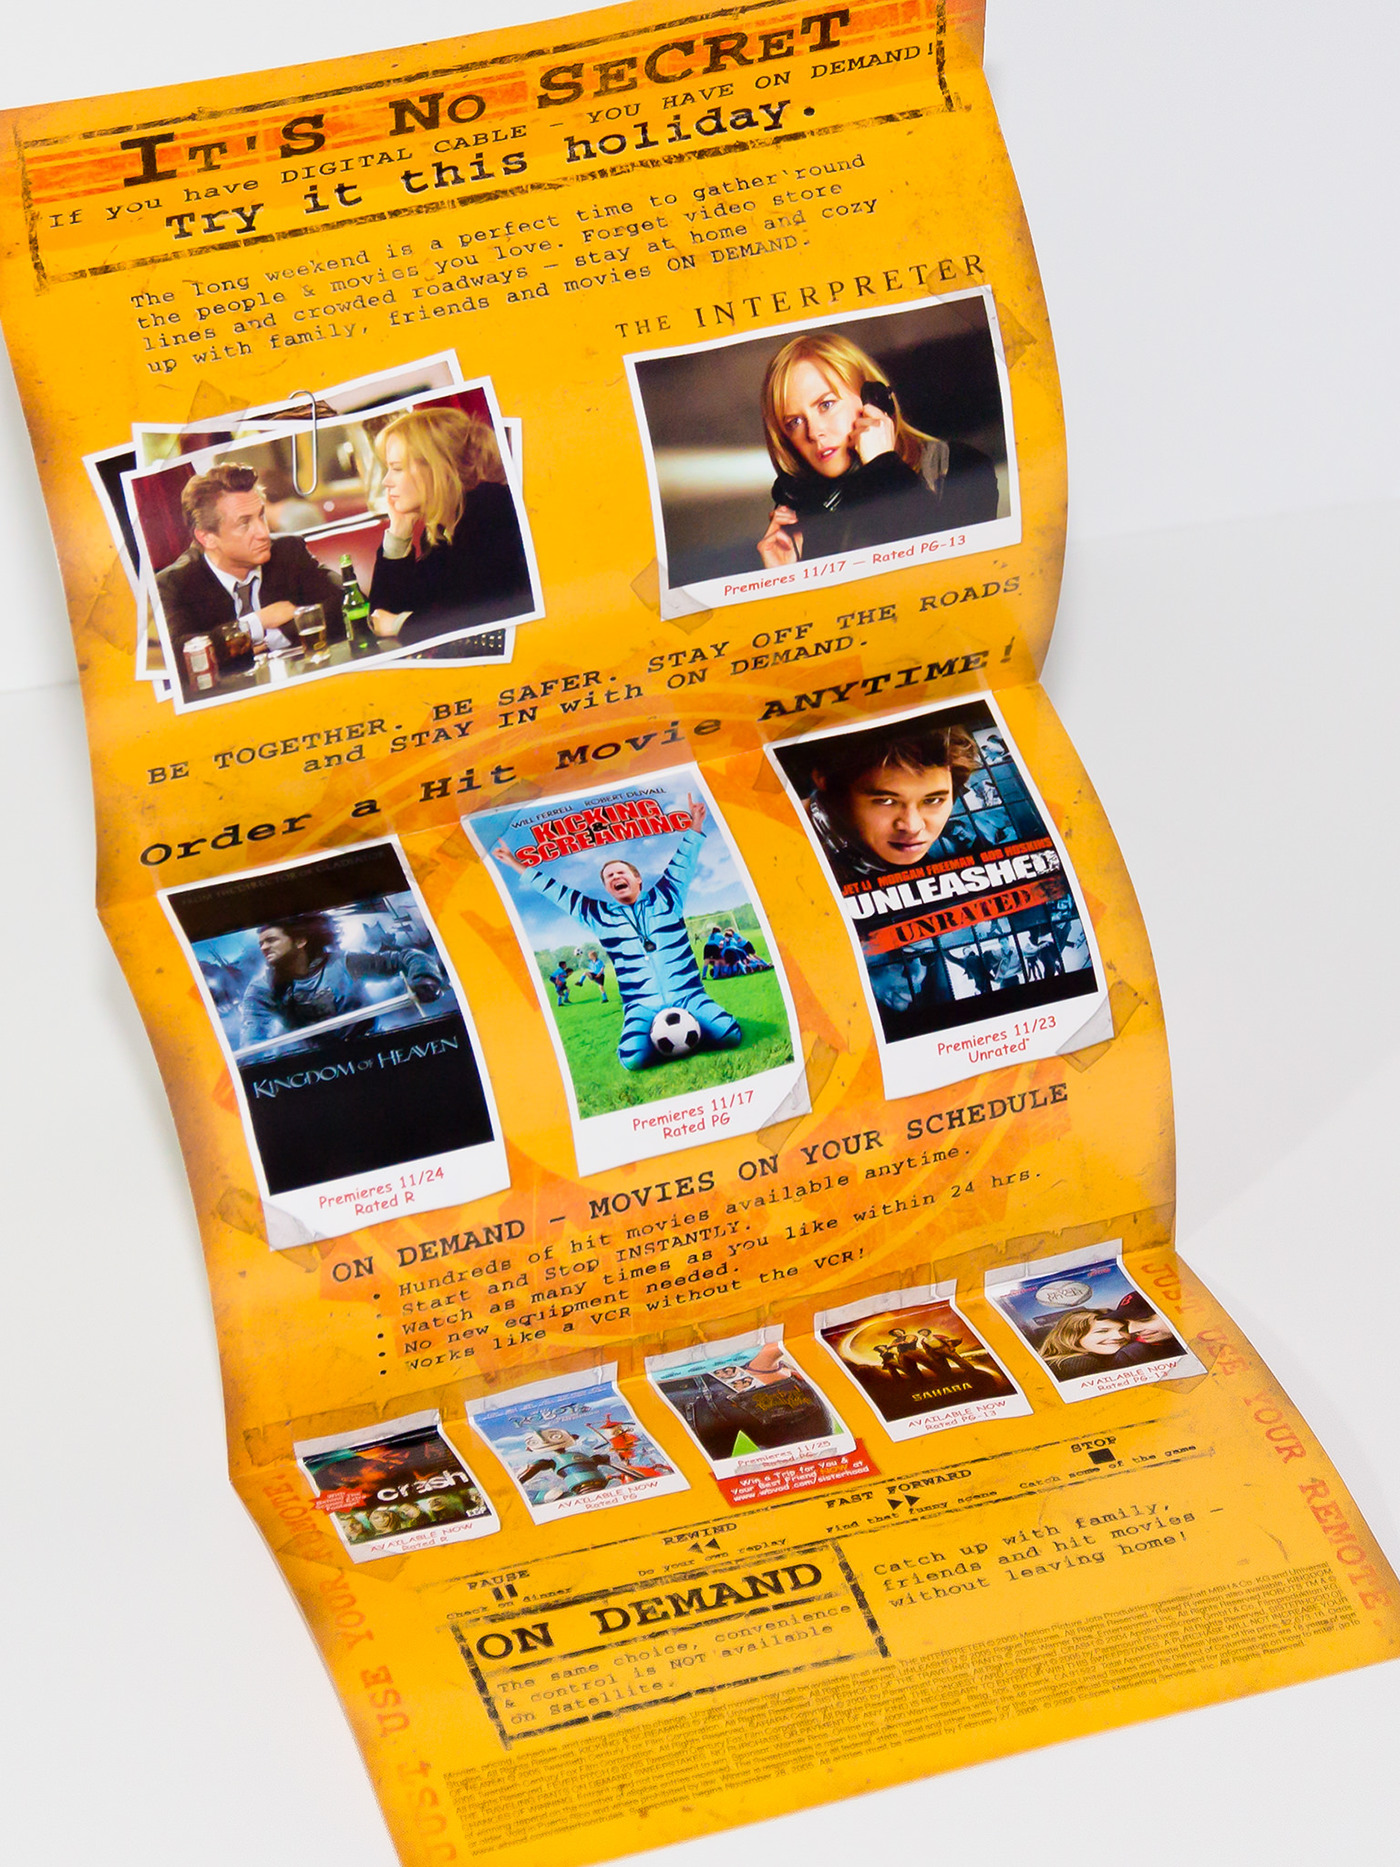 thanksgiving mailer top secret envelope Direct mail Movies on demand interpreter